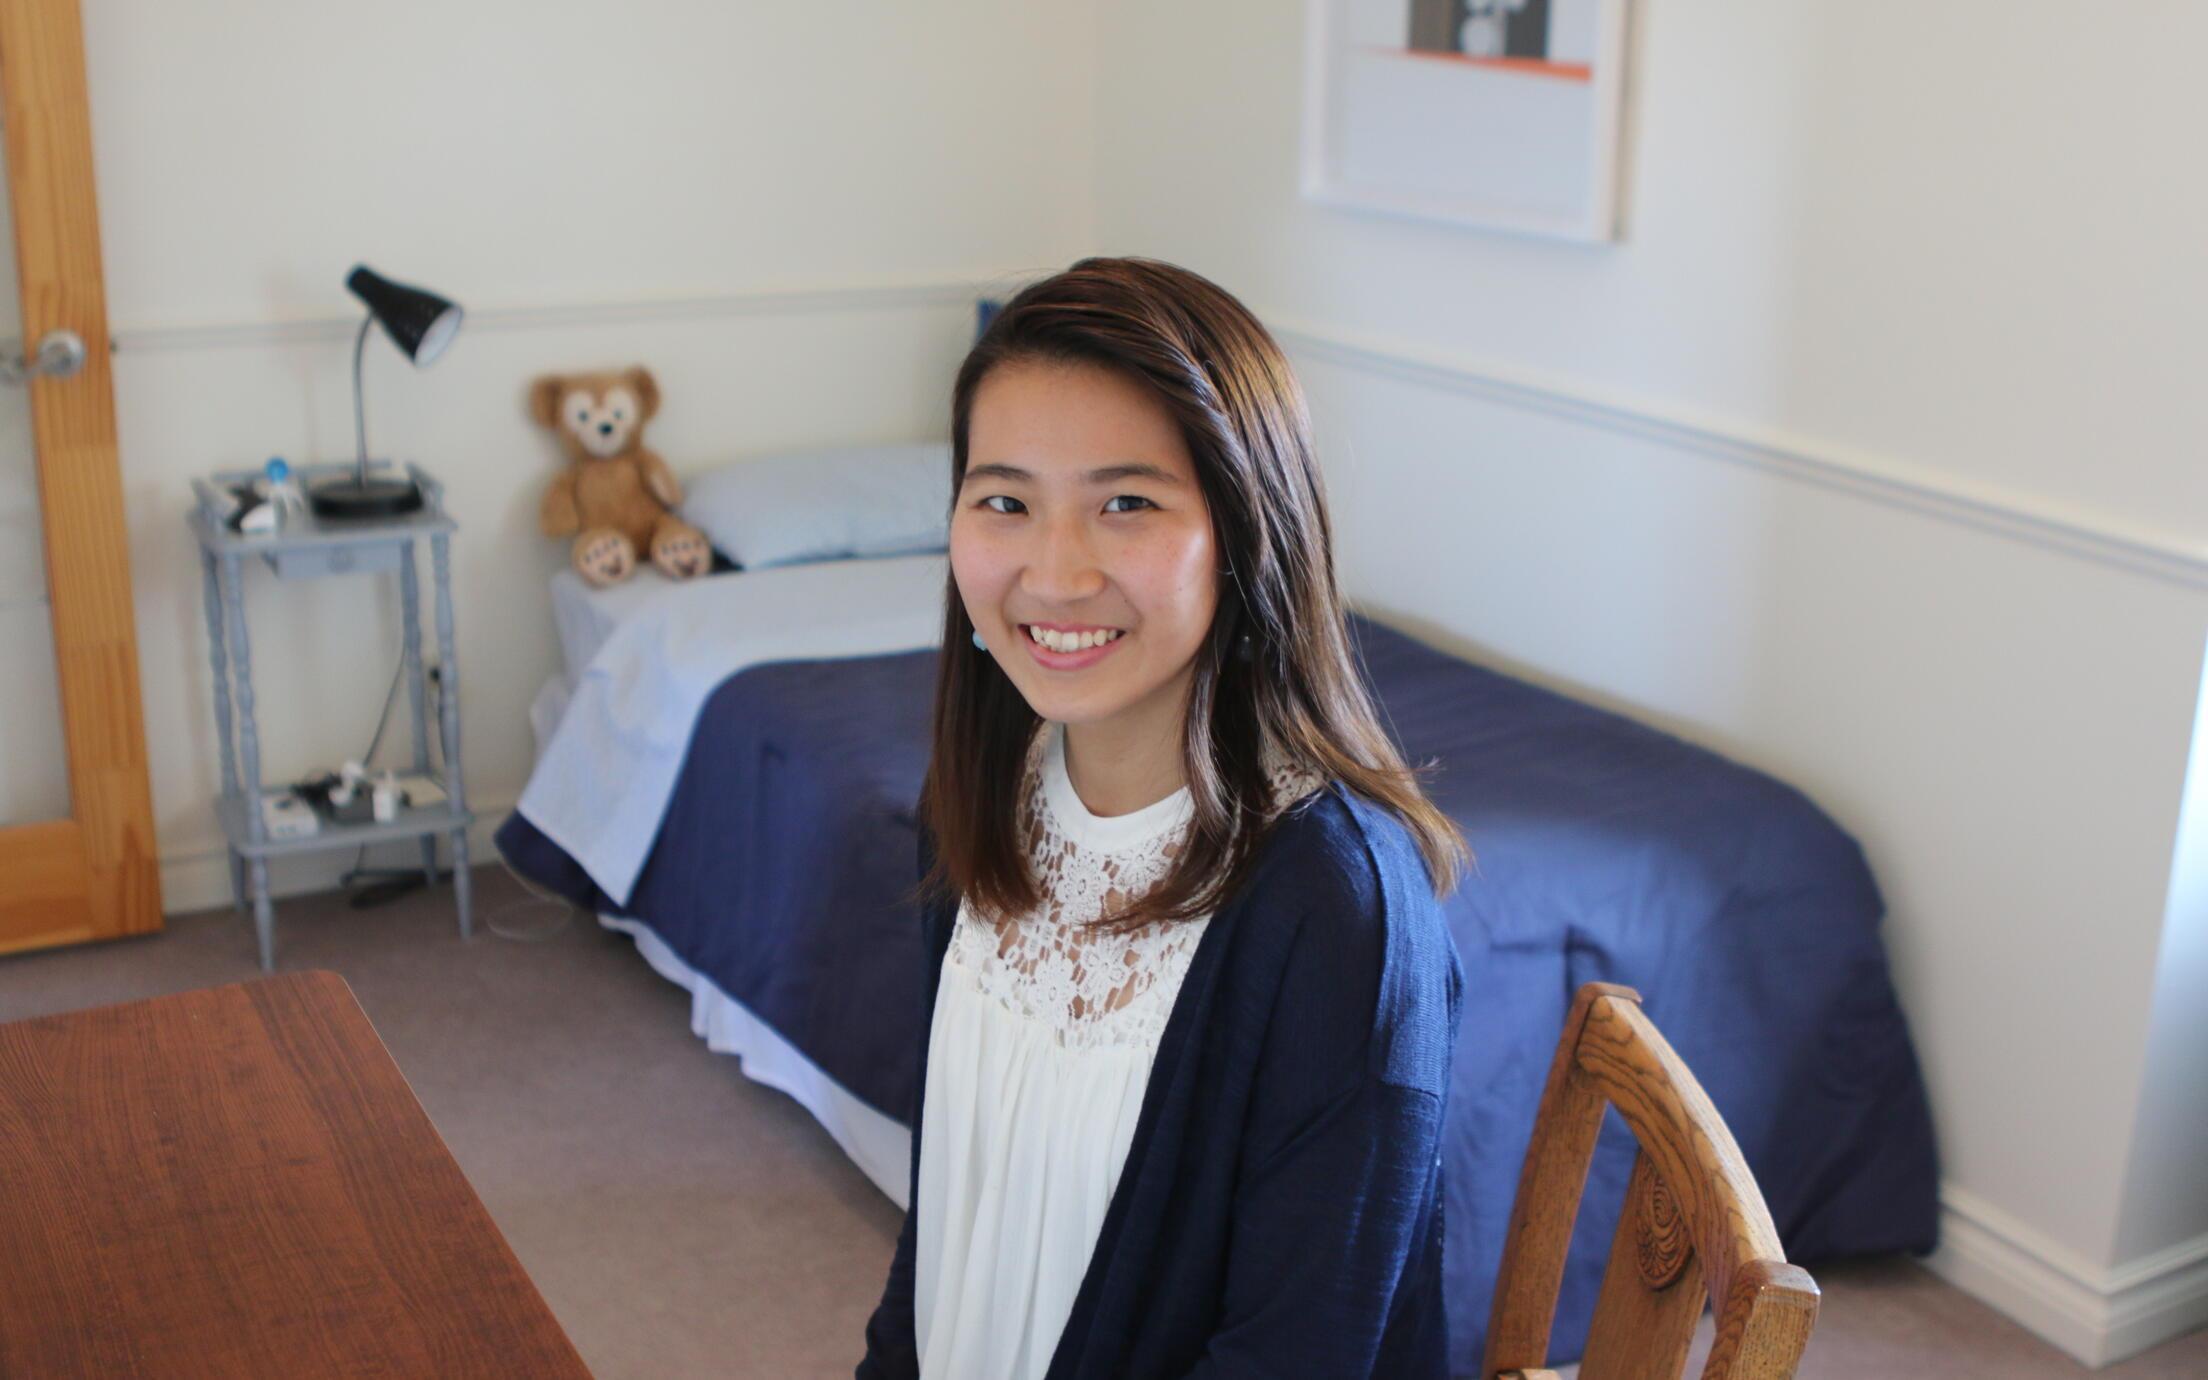 VIU Homestay student and bedroom